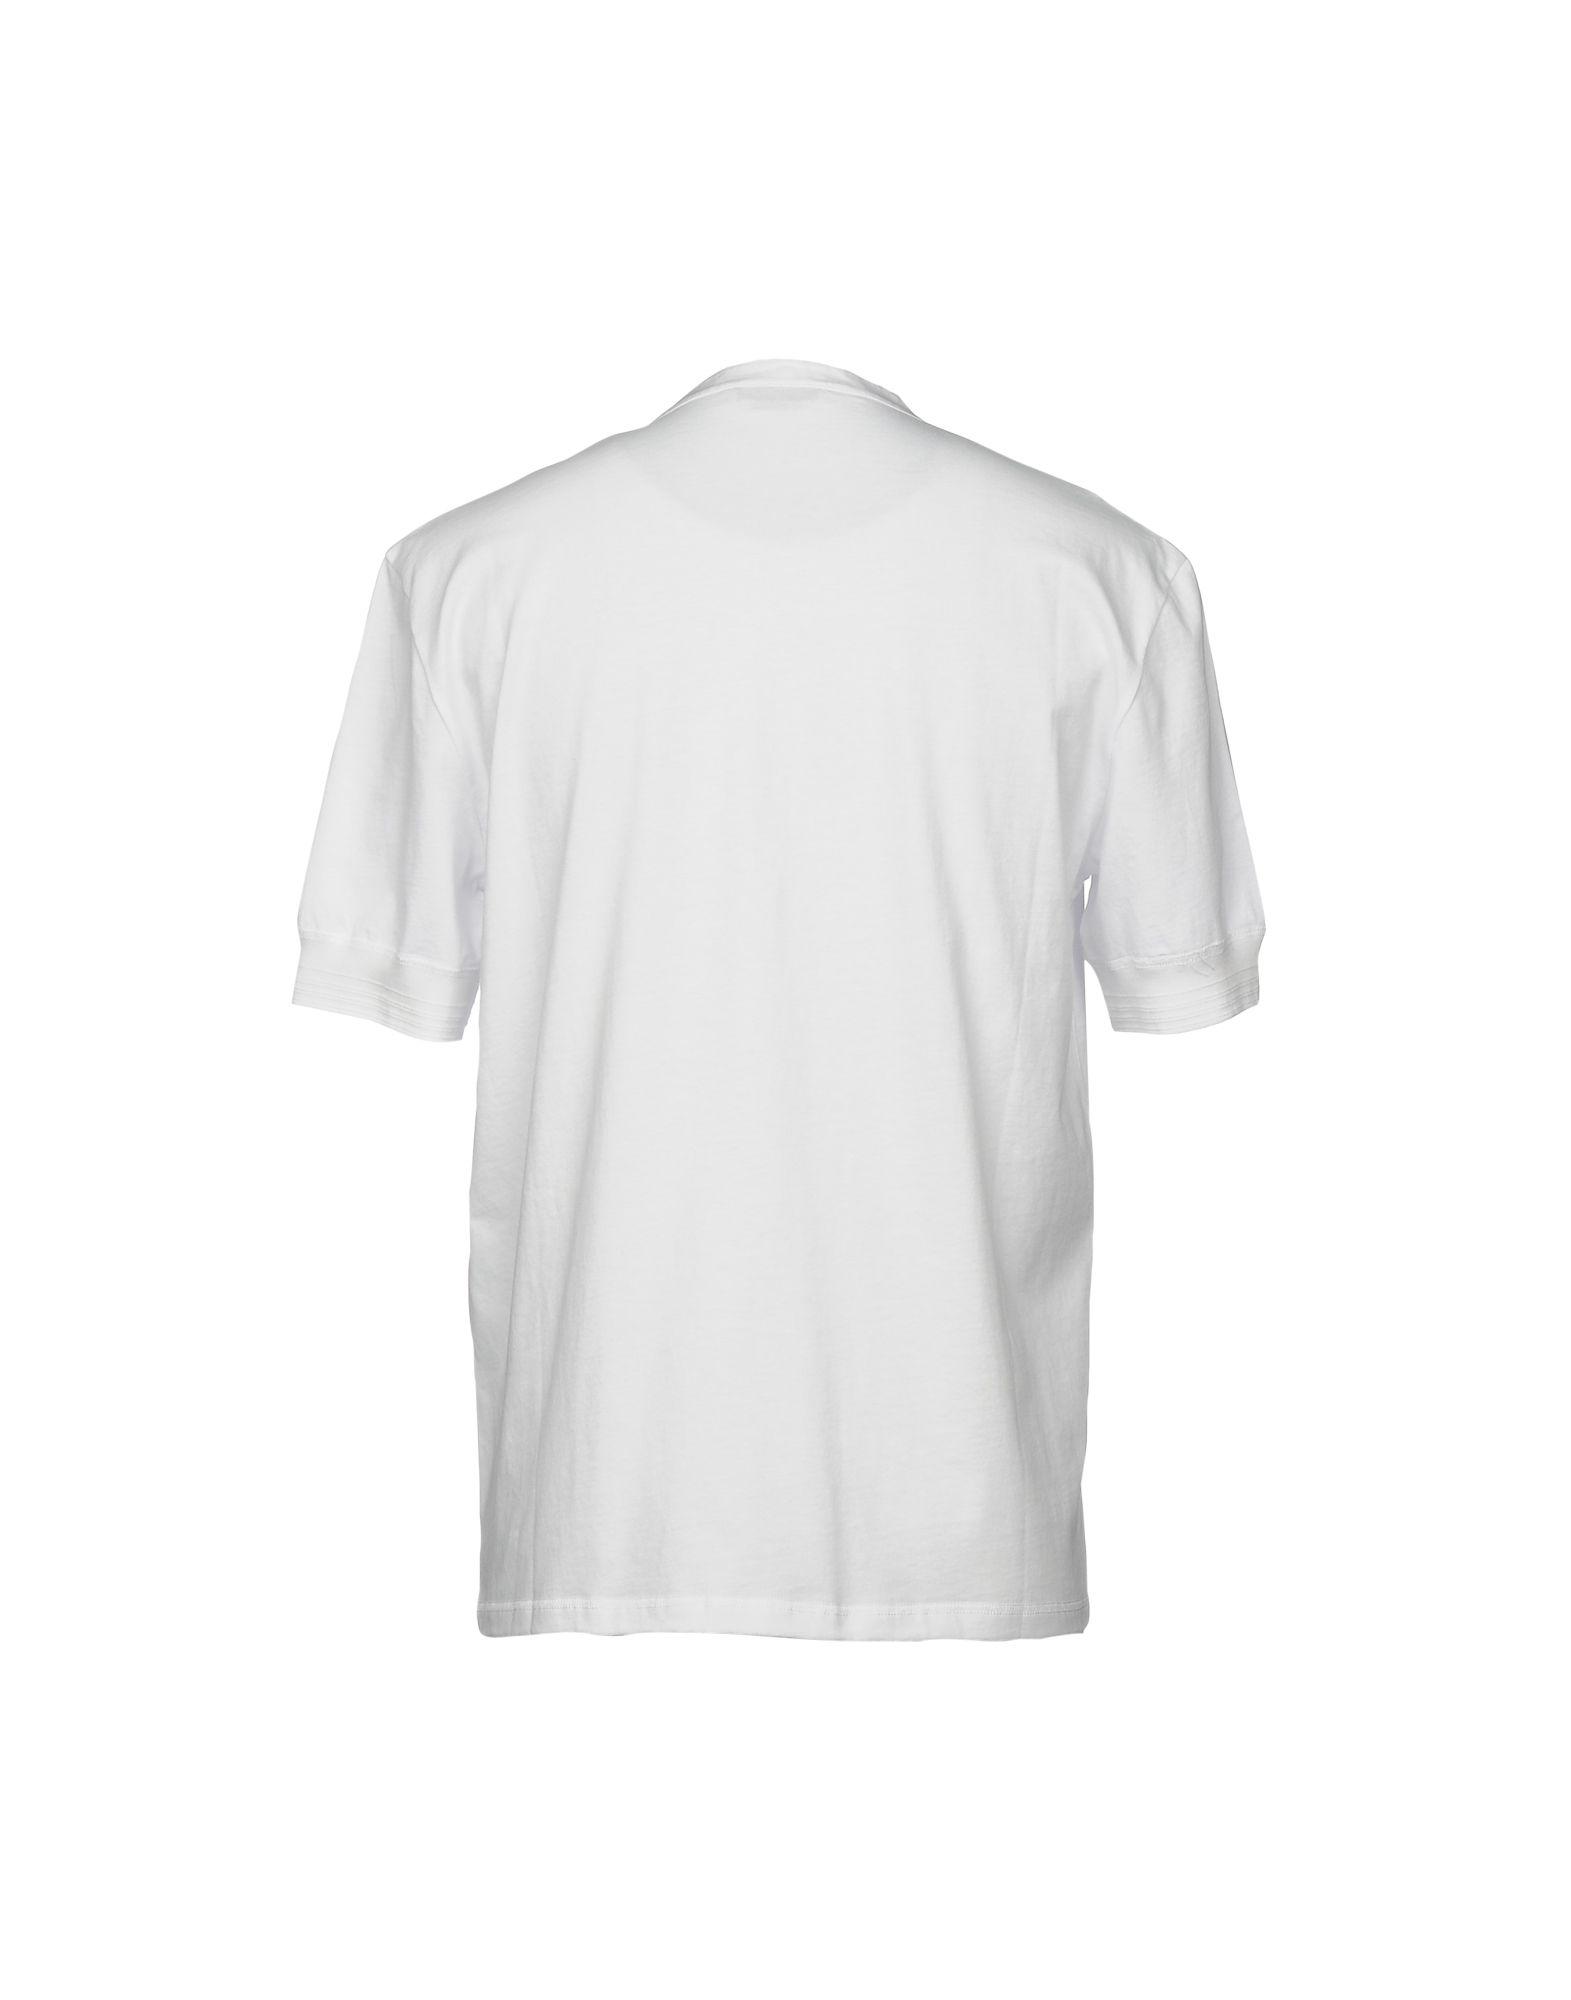 T-Shirt Alexander Uomo Mcqueen Uomo Alexander - 12140244PI e3d6a0